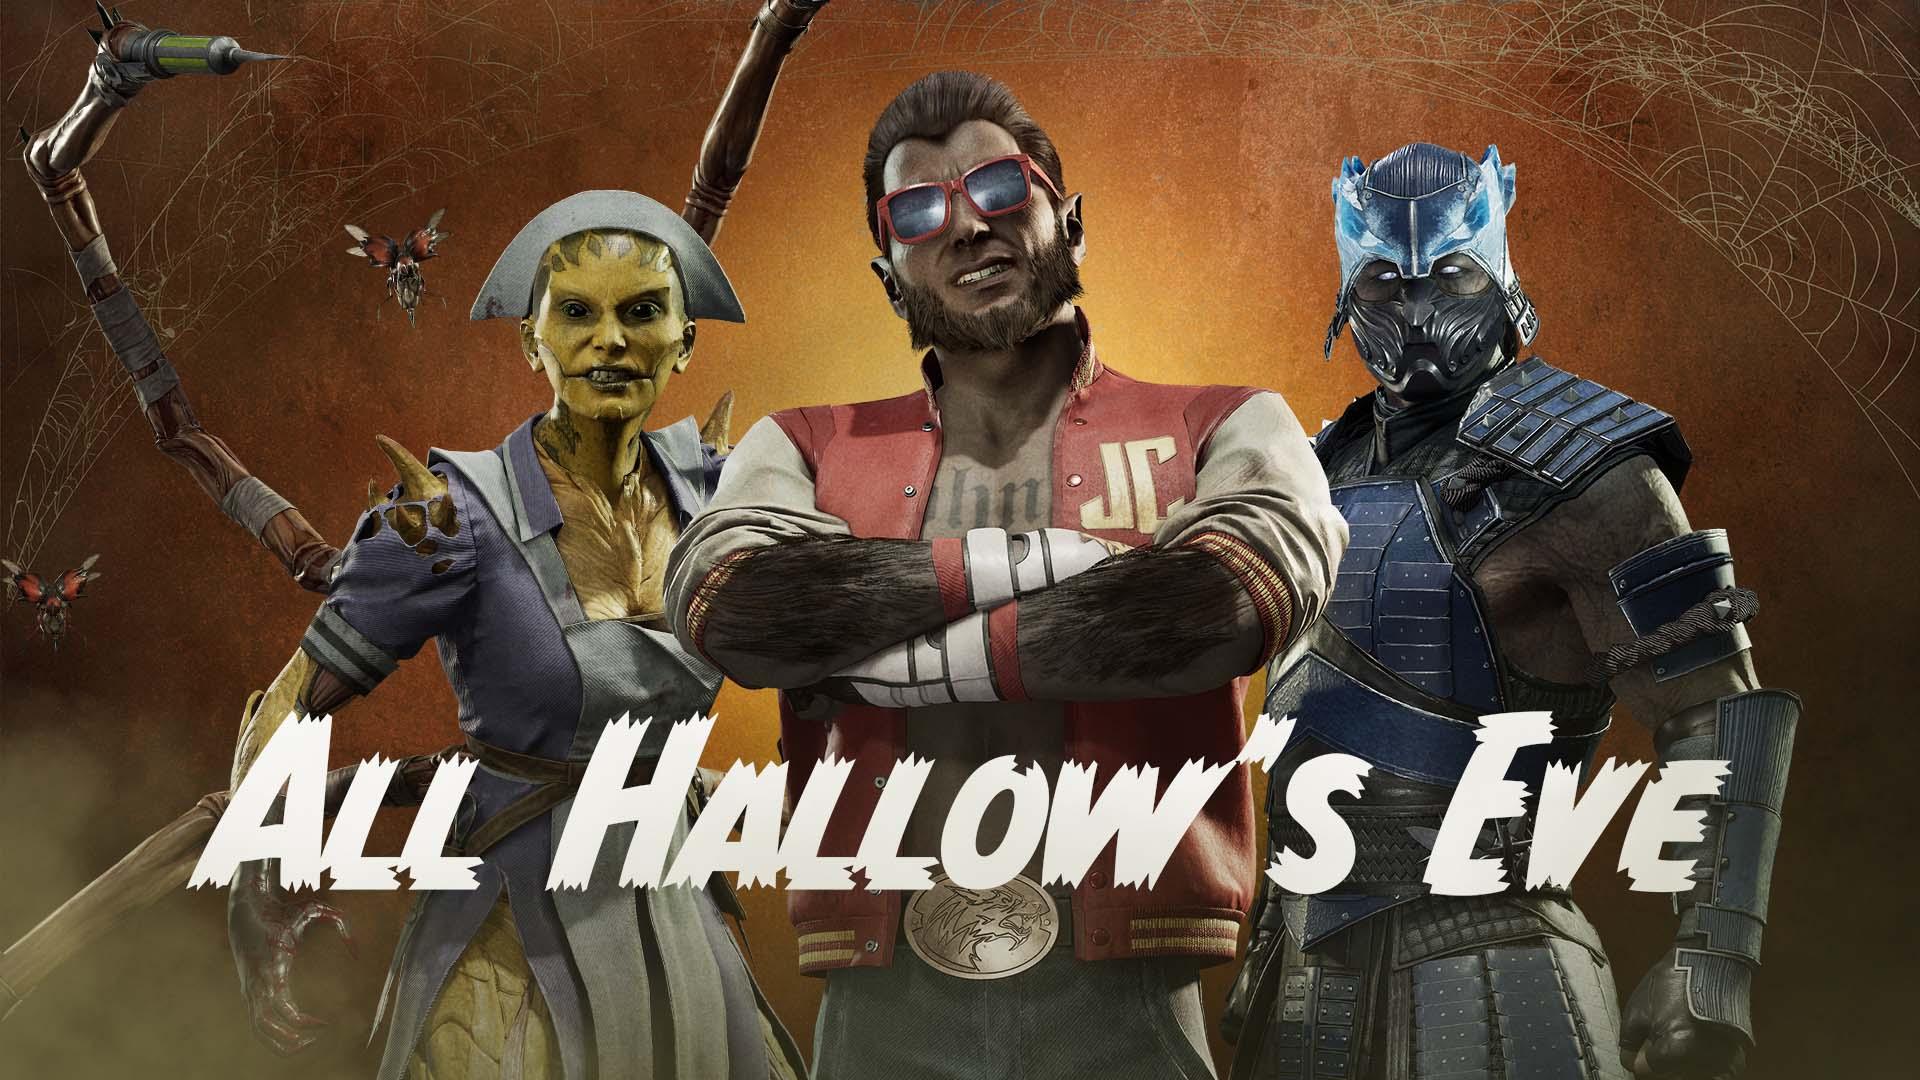 'Mortal Kombat 11: Aftermath's Latest Skin Pack Brings Halloween Vibes